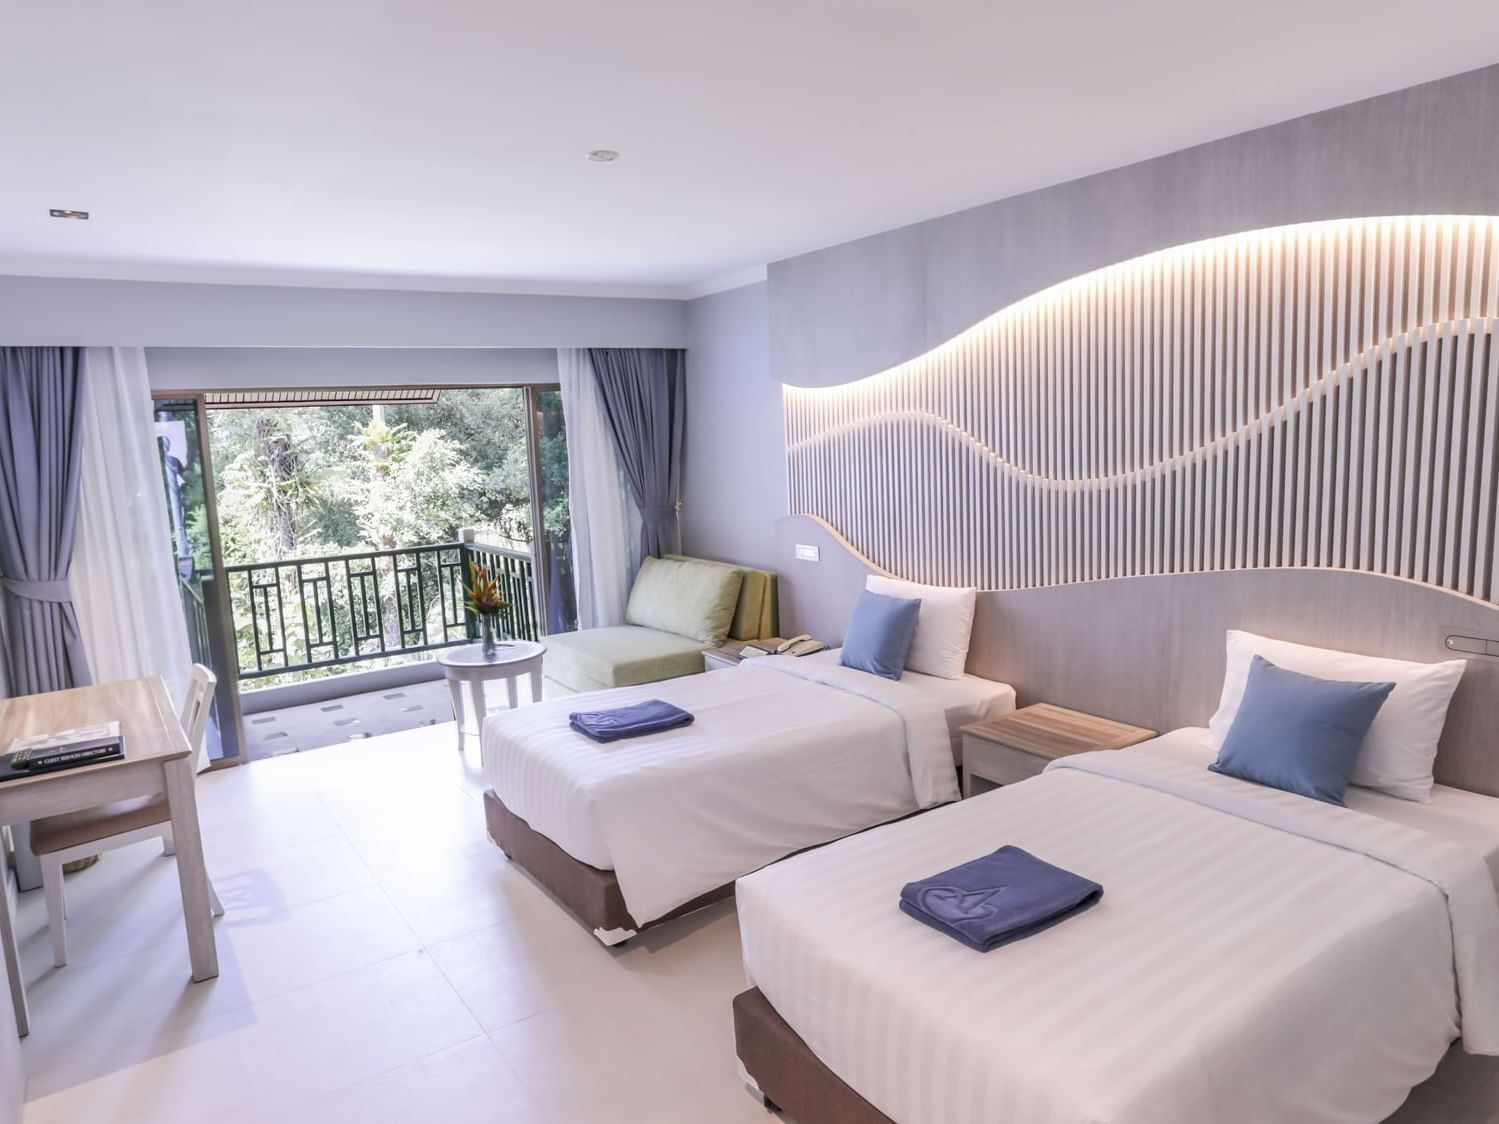 Deluxe Garden View Room at Amora Hotel